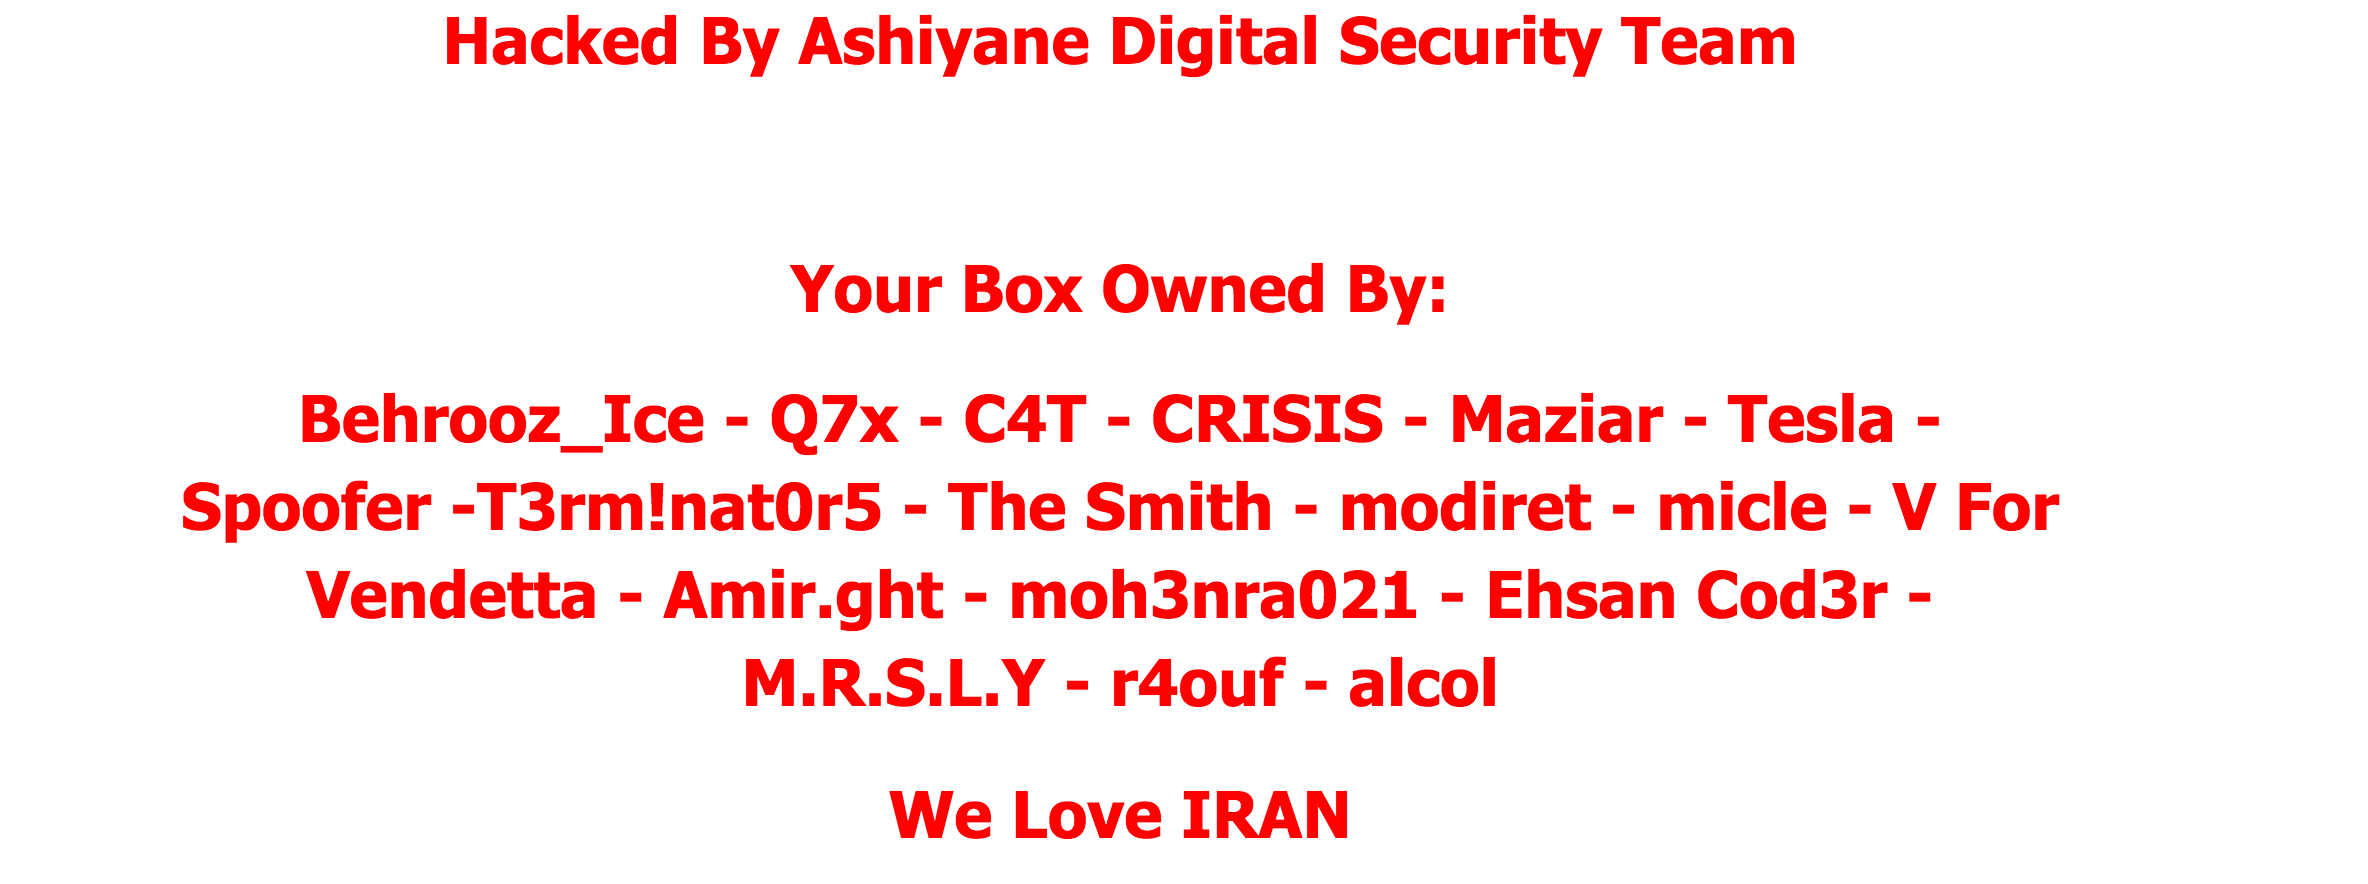 Screenshot of defacement uploaded to all Ukrainian websites by Ashiyane Digital Security Team